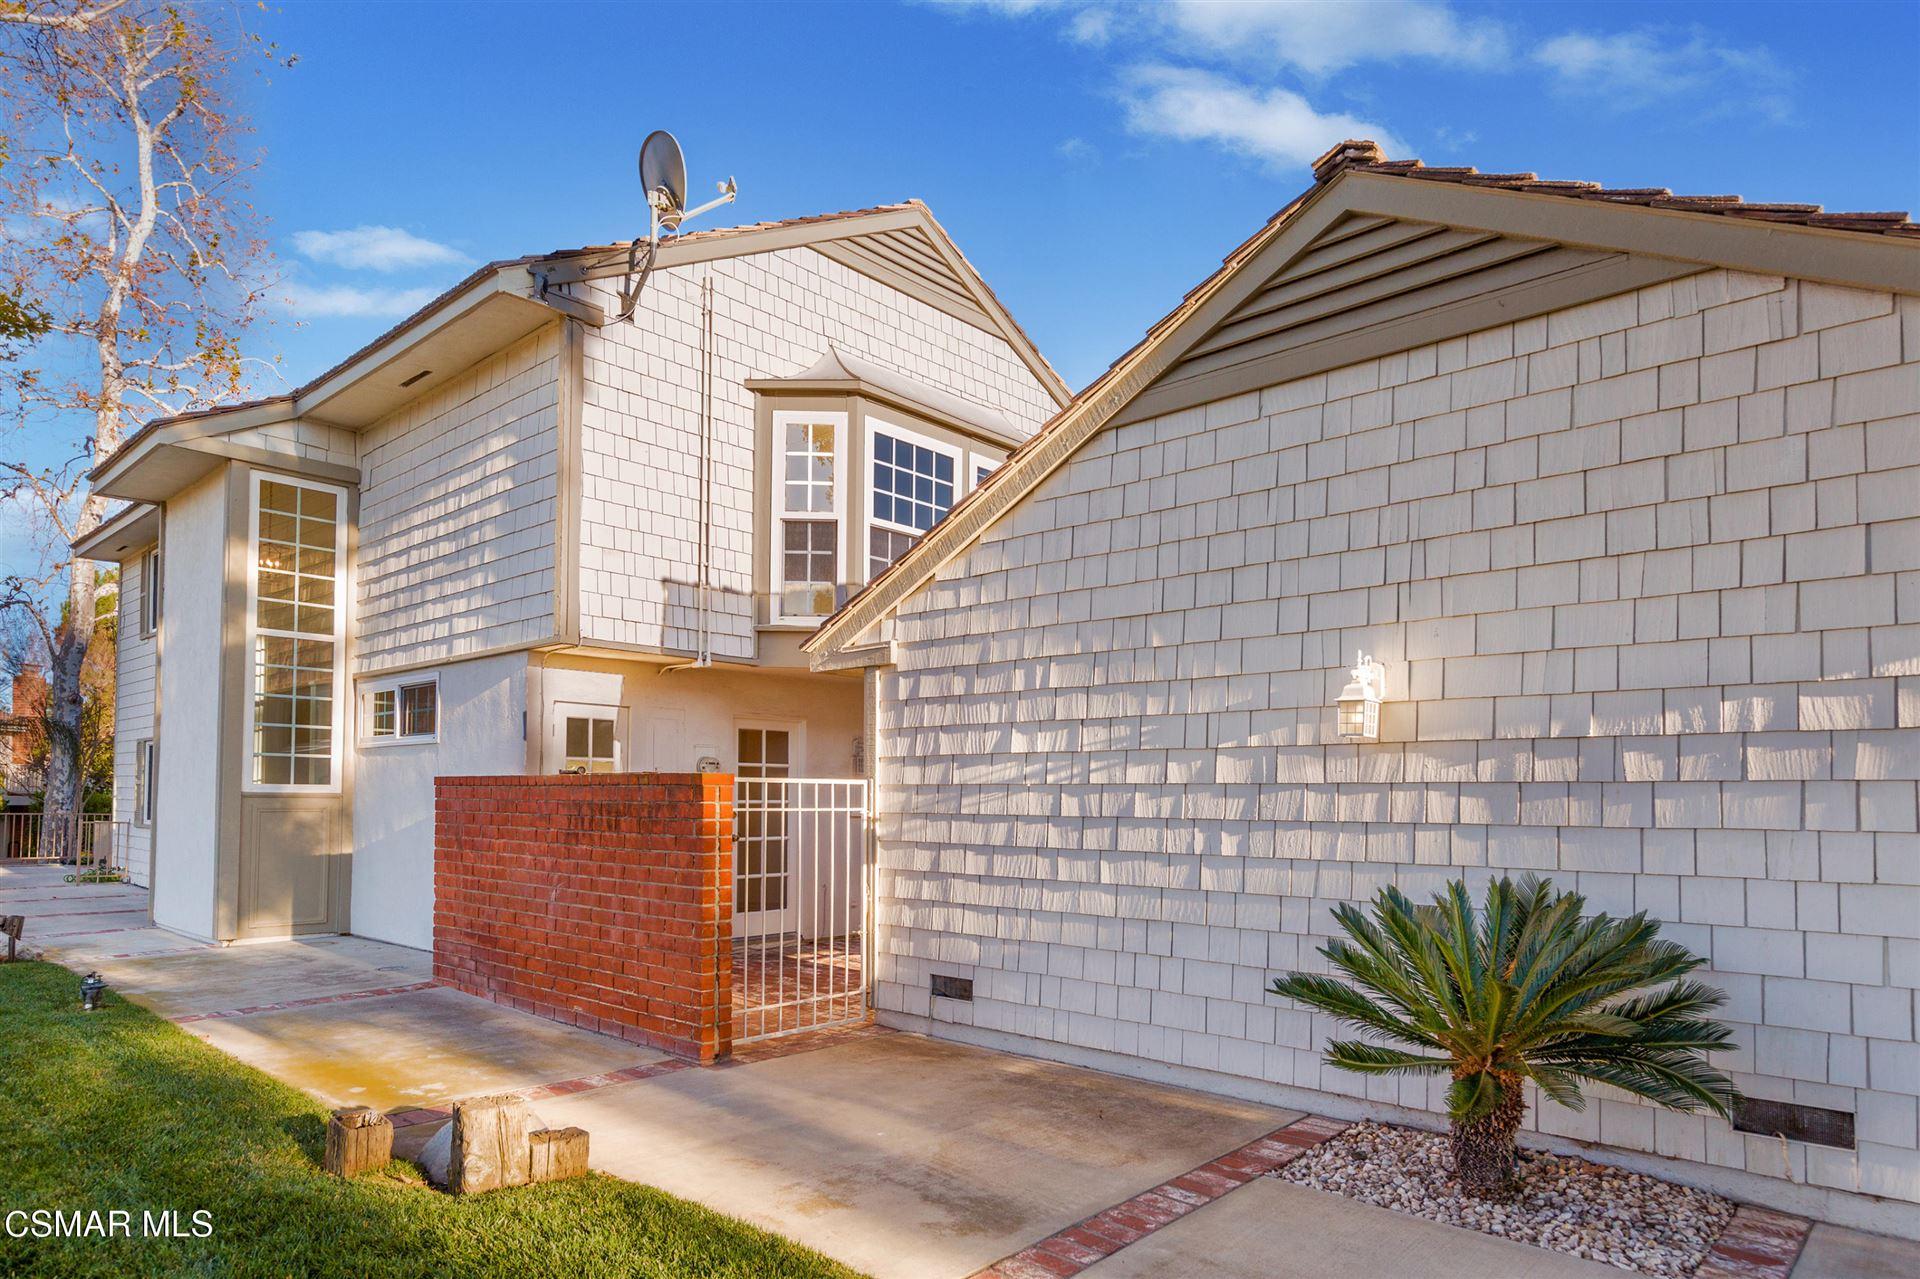 32149 Lake Meadow Lane, Westlake Village, CA 91361 - MLS#: 221000274